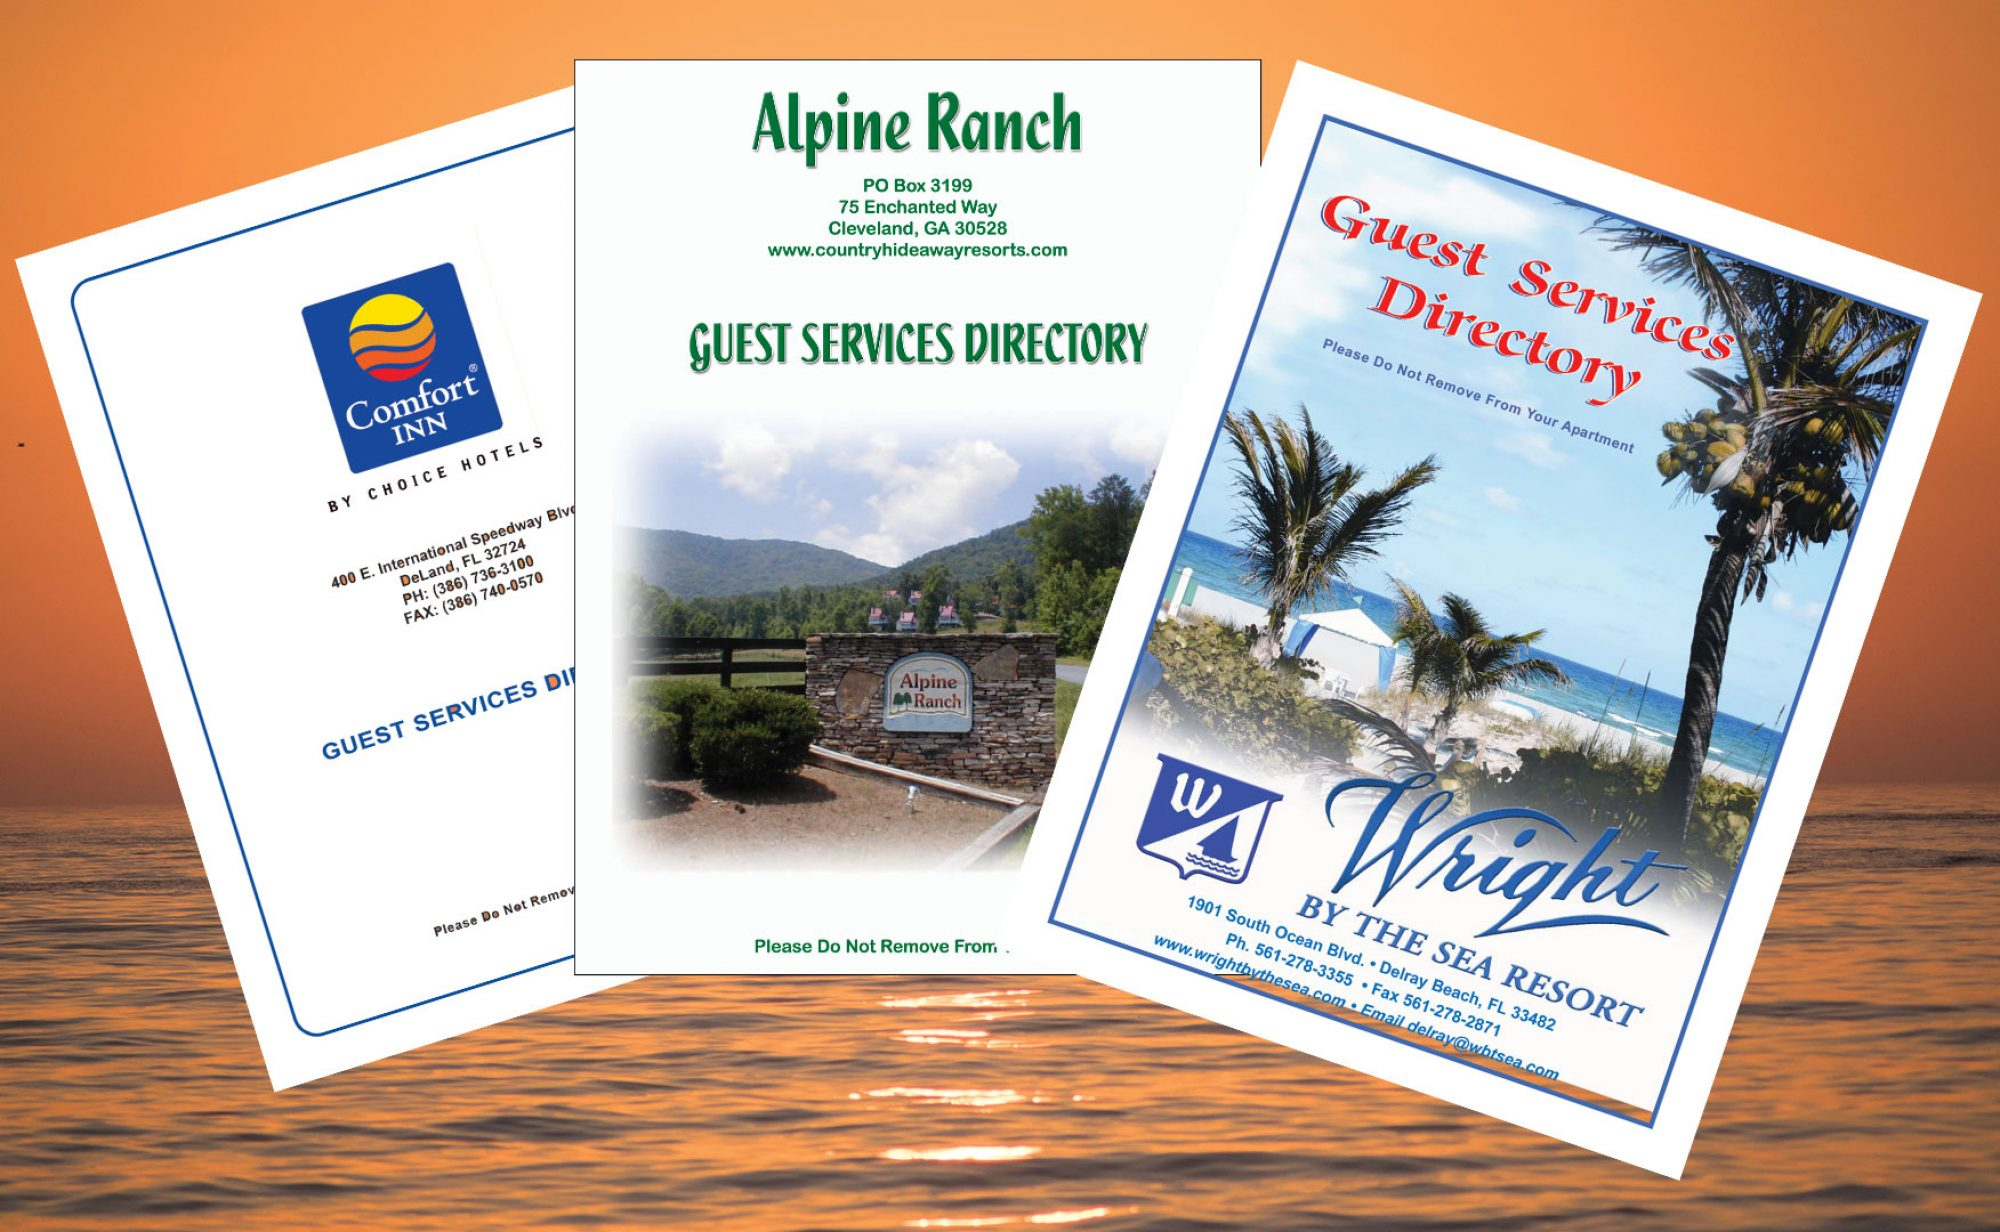 Global Resort Publications